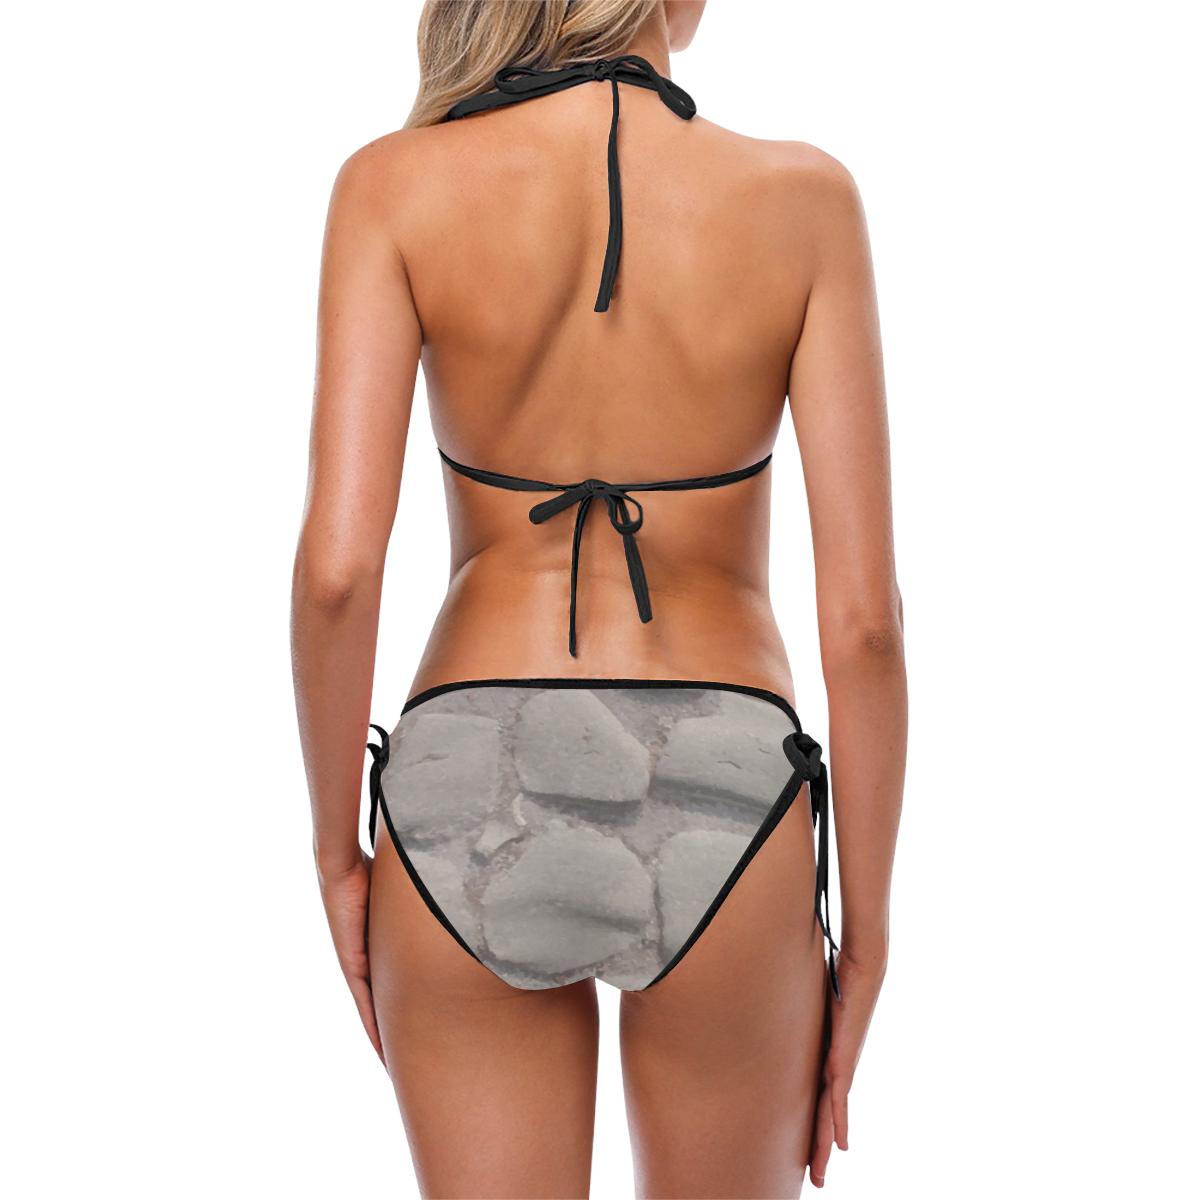 Stone Bikini Custom Bikini Swimsuit (Model S01)